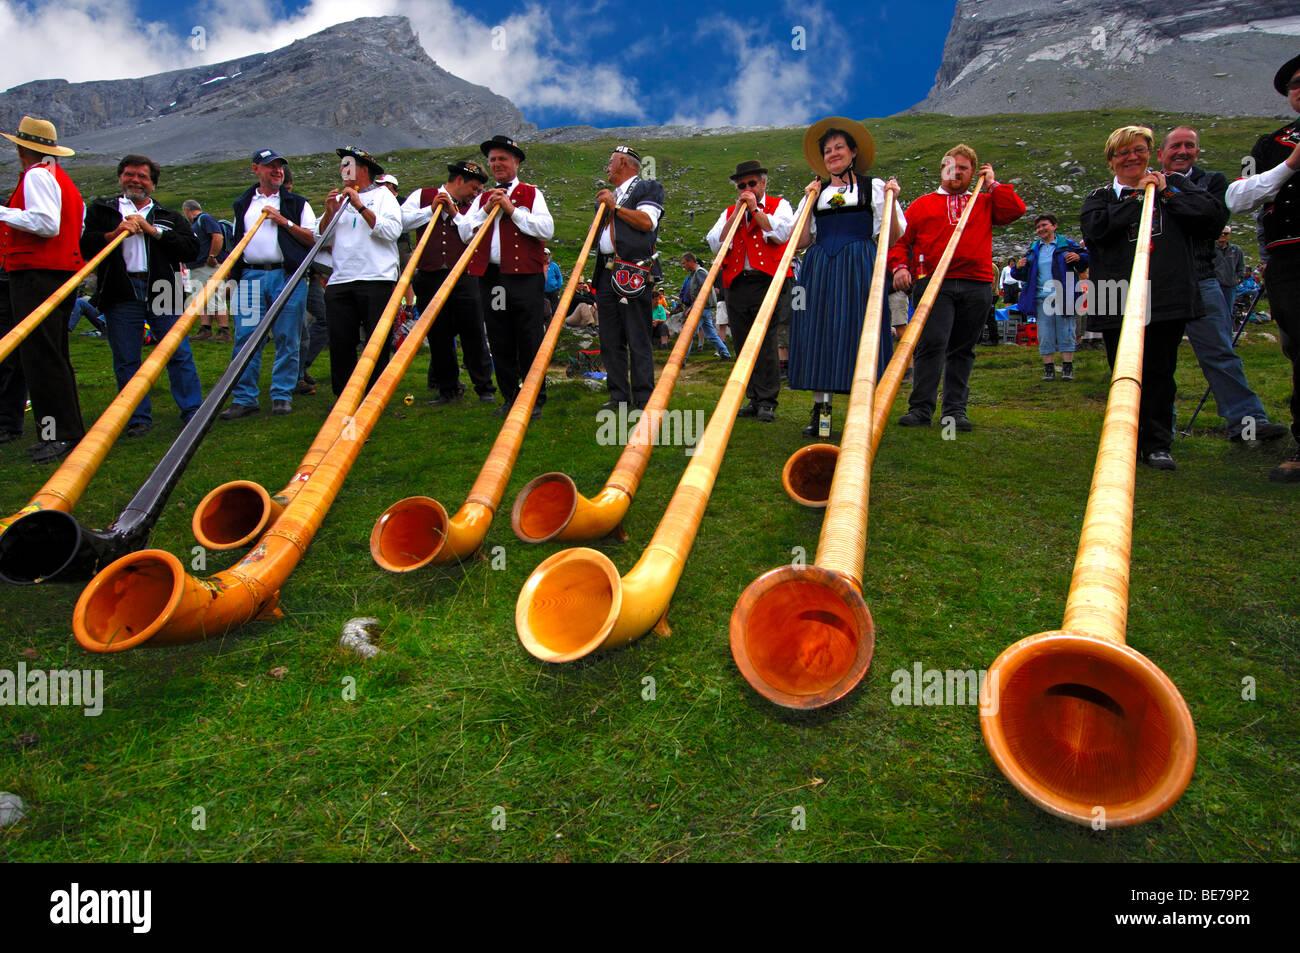 Alphorn blowers at the shepherd festival on Gemmi, Leukerbad, Loeche-les-Bains, Valais, Switzerland Stock Photo